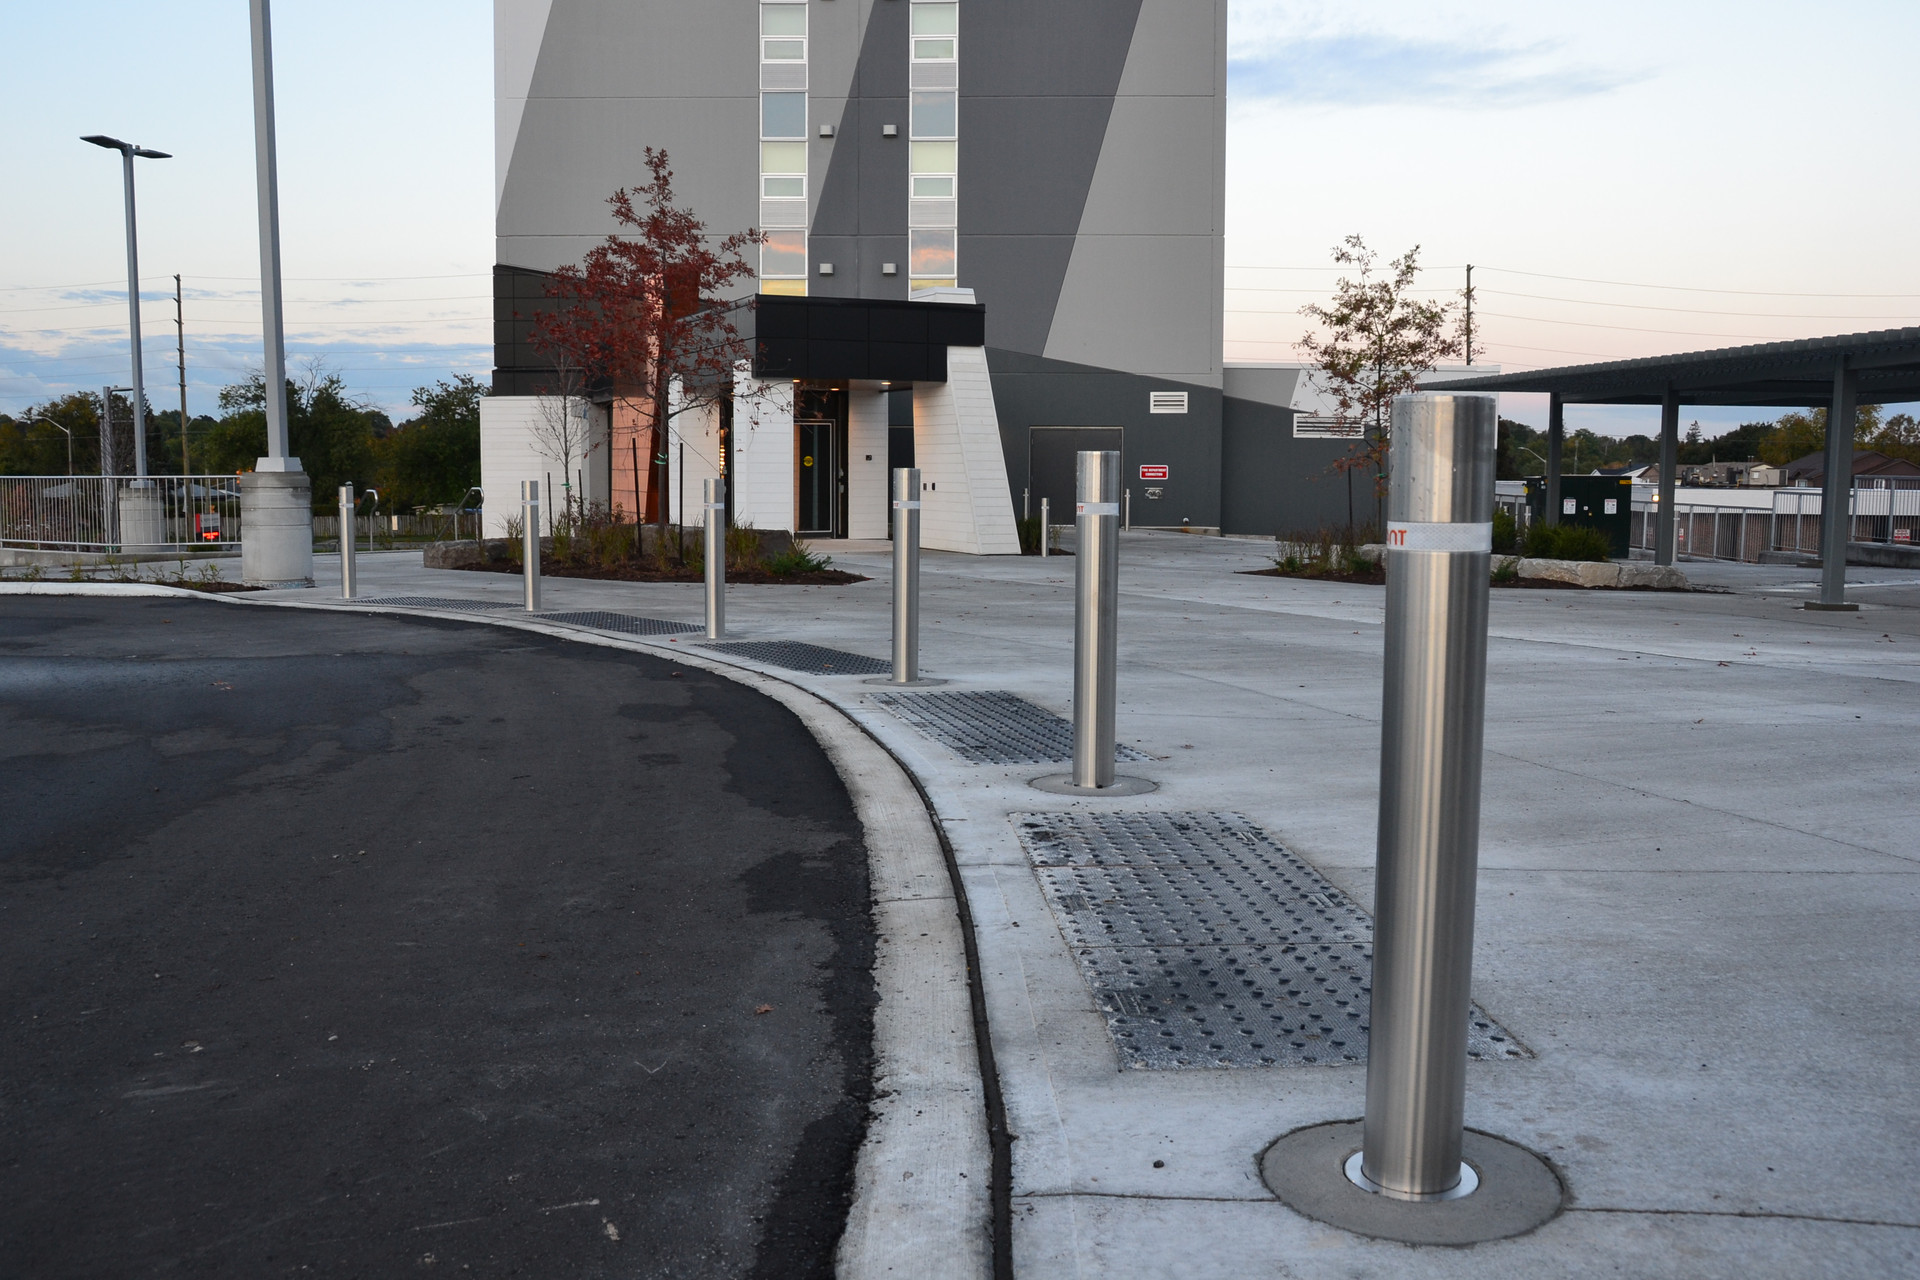 Trent U Oshawa - Campus Accessibility